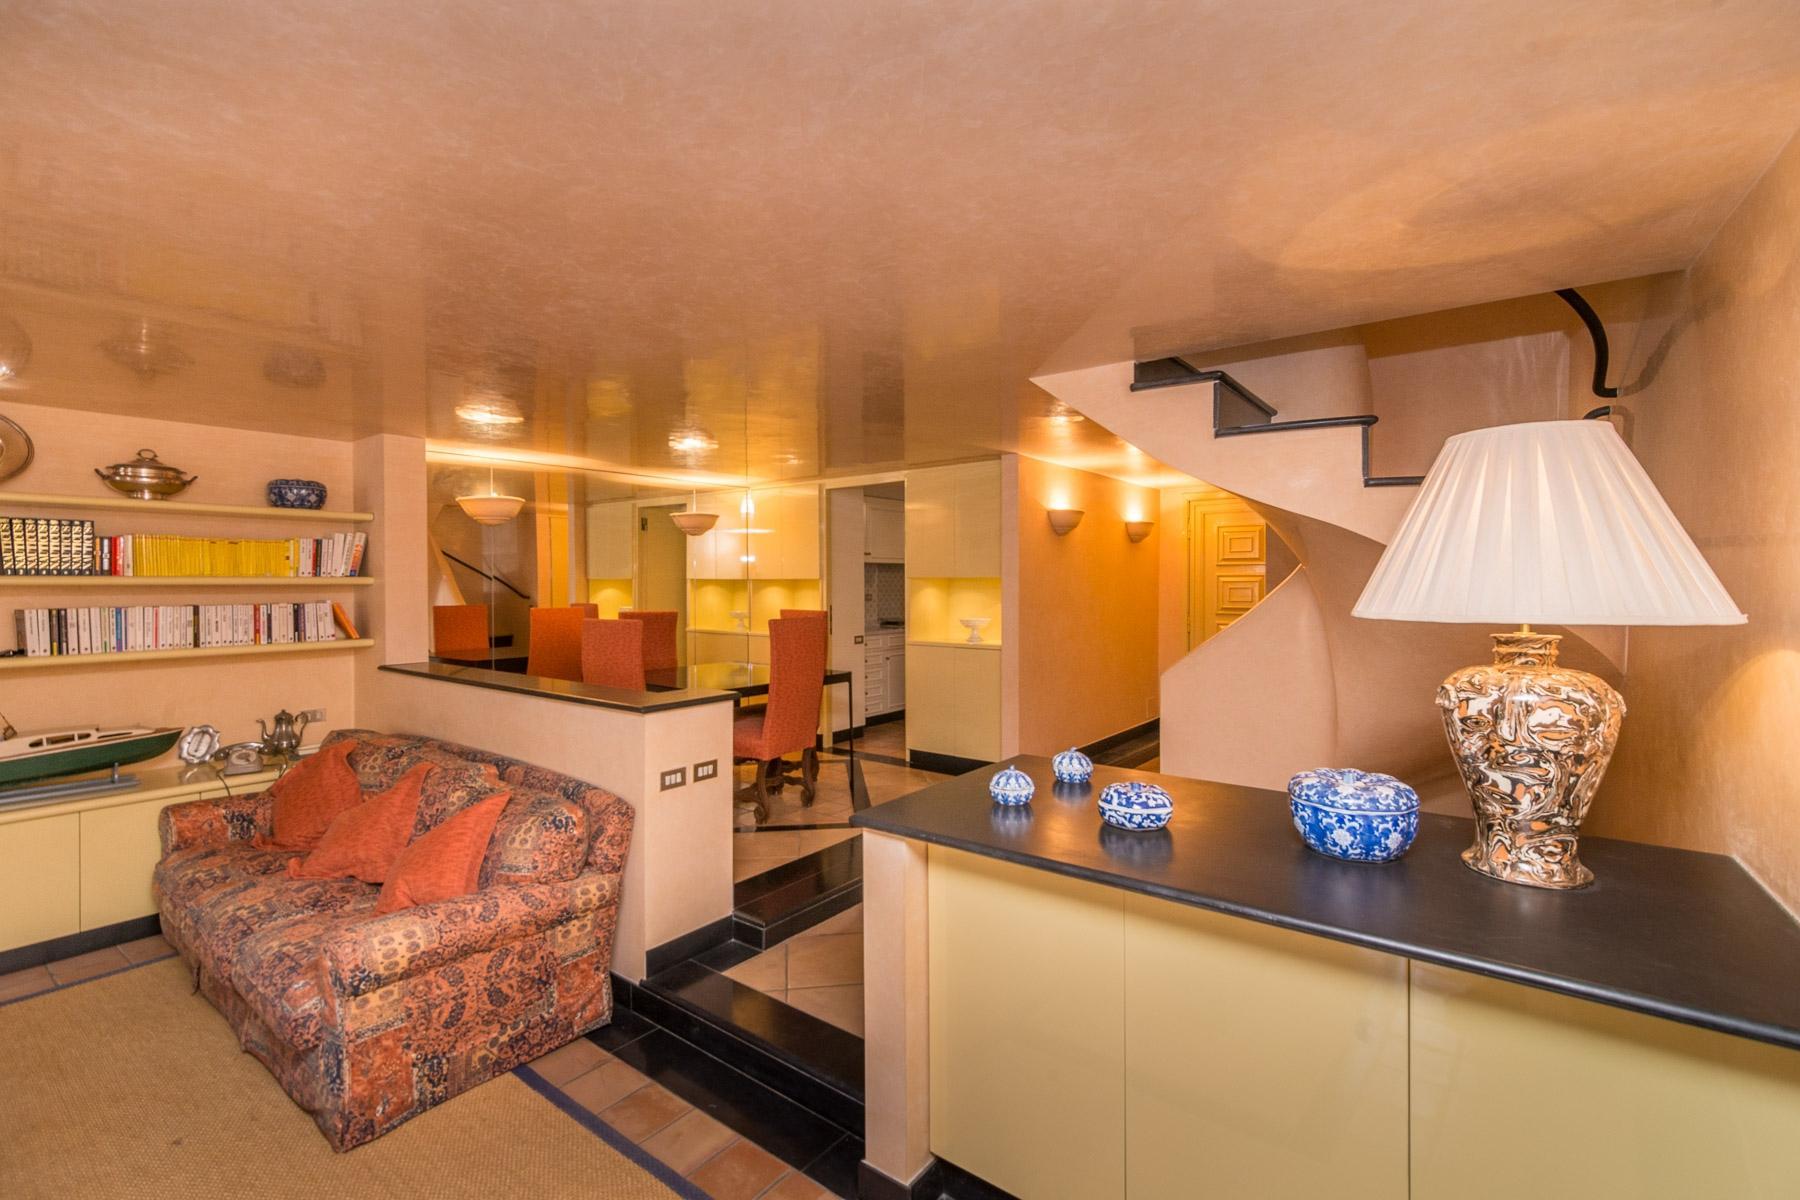 Charmante Wohnung am Portifino Piazzetta - 11